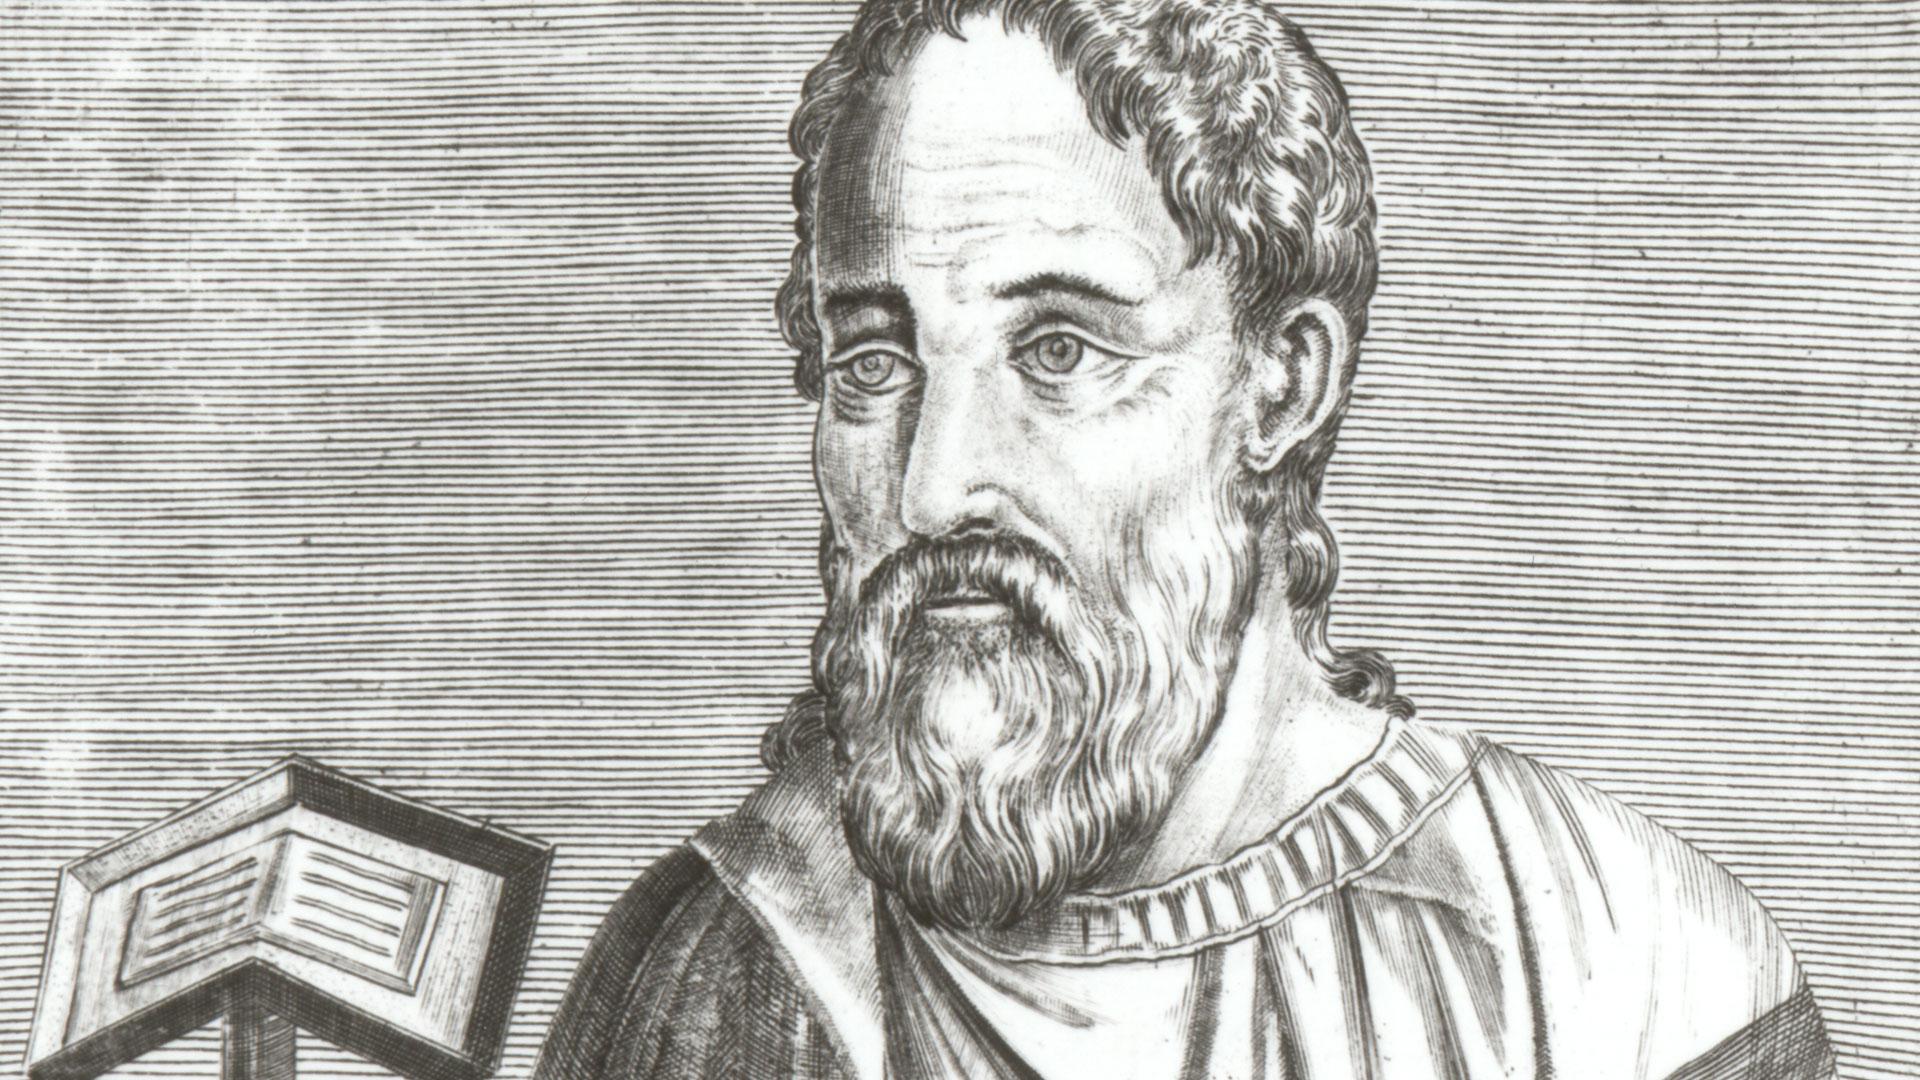 2004summer_eusebius-pamphilus-father-of-church-history_1920x1080_1.jpg